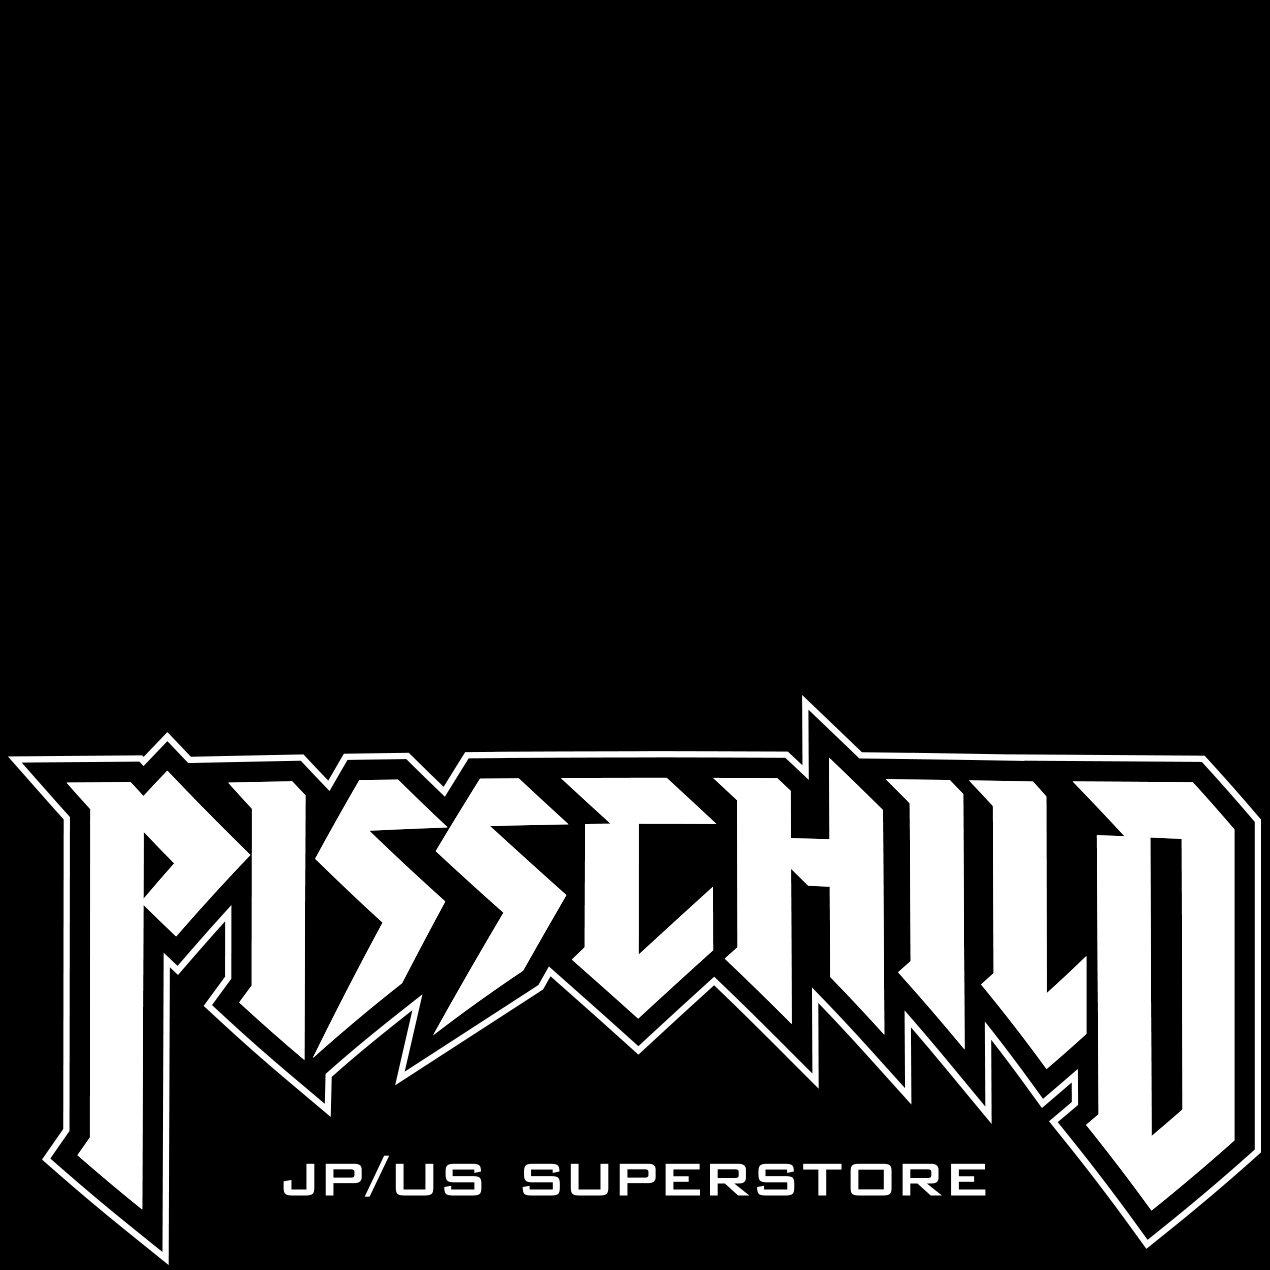 PISSCHILD ATHLETICS JP/USA STREETWEAR SUPERSTORE